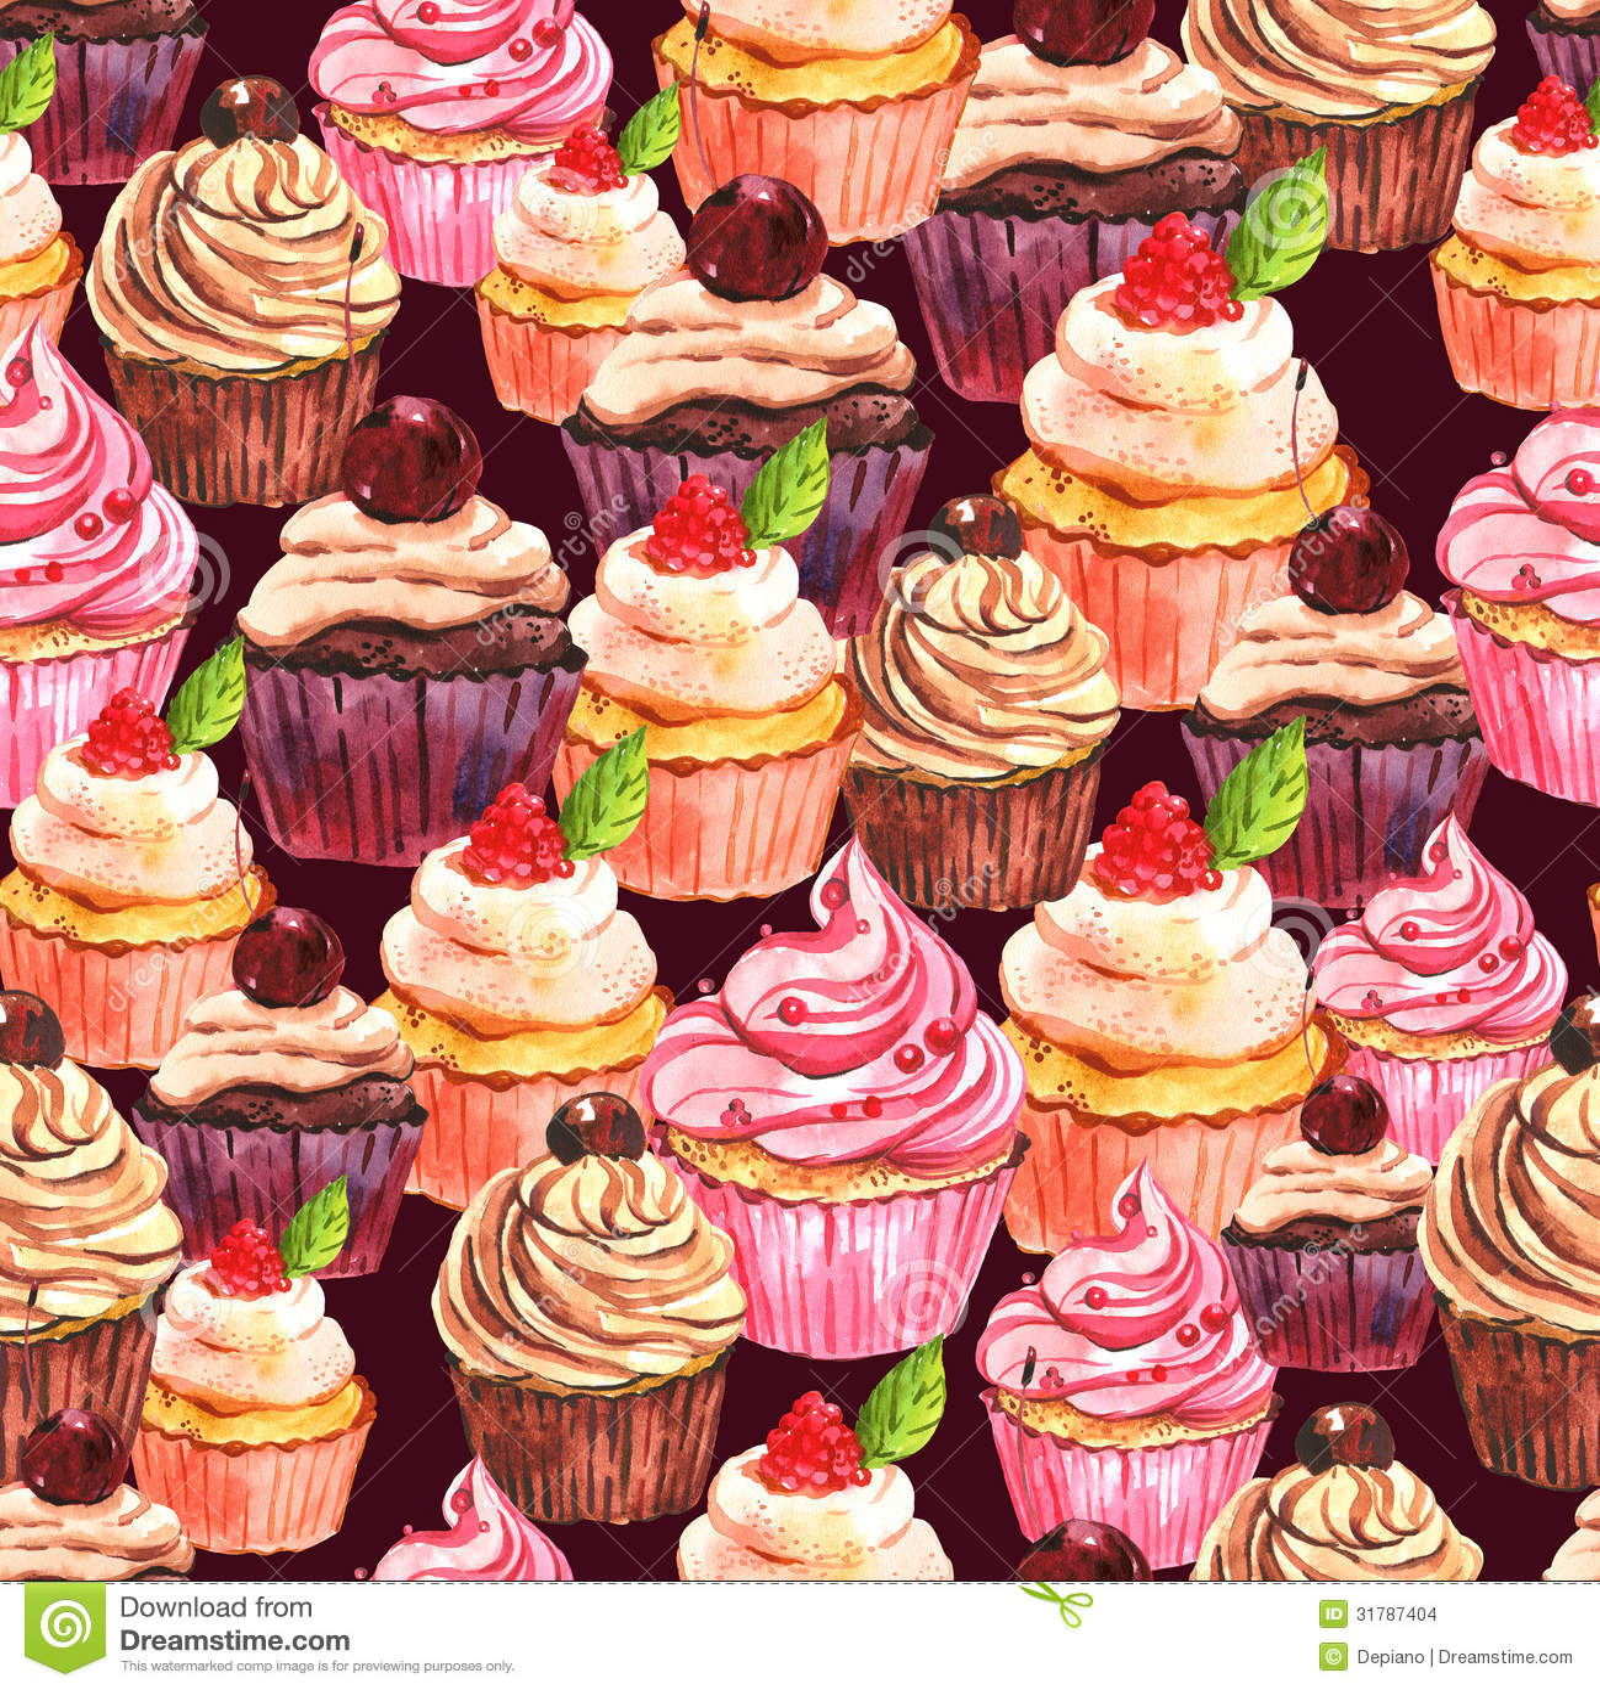 Cute Dessert Wallpaper Watercolor Seamless Cupcake Background Stock Illustration